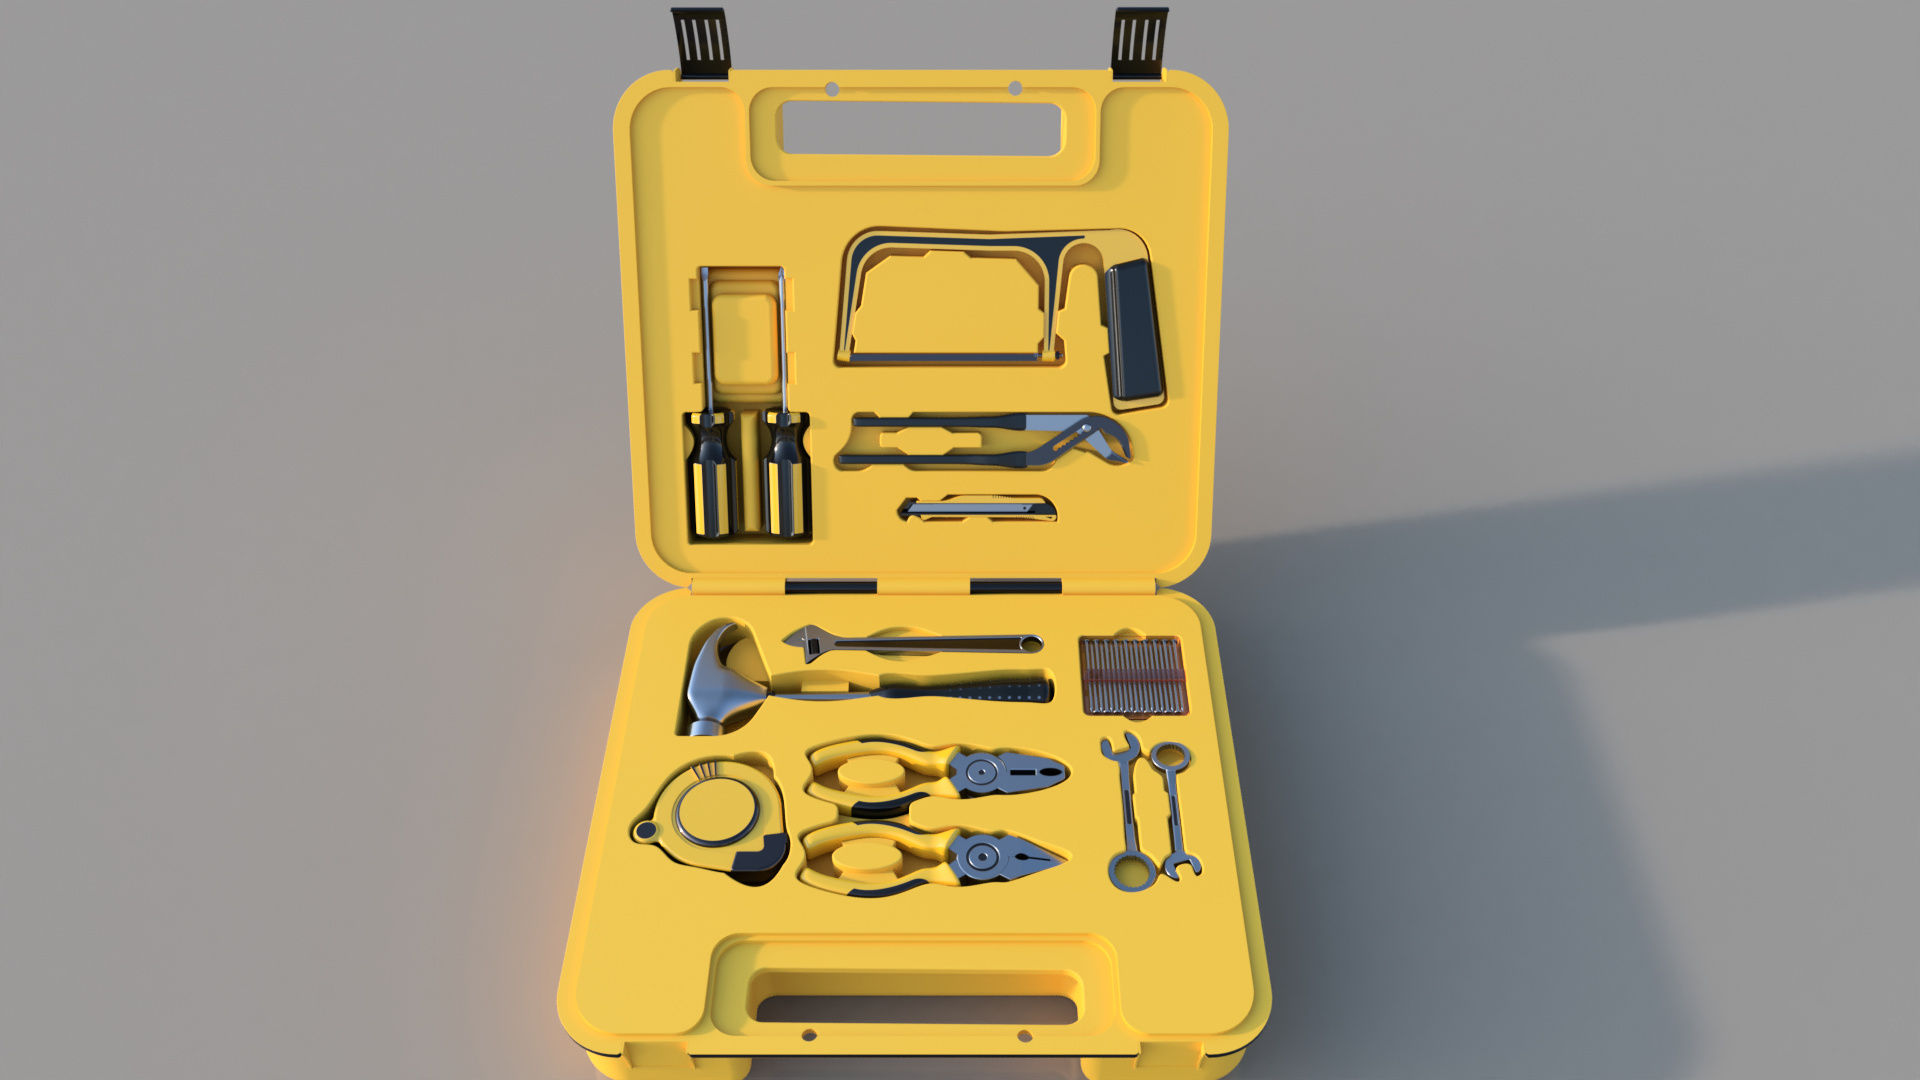 Modern hand tool kit autodesk online gallery for Online rendering tool